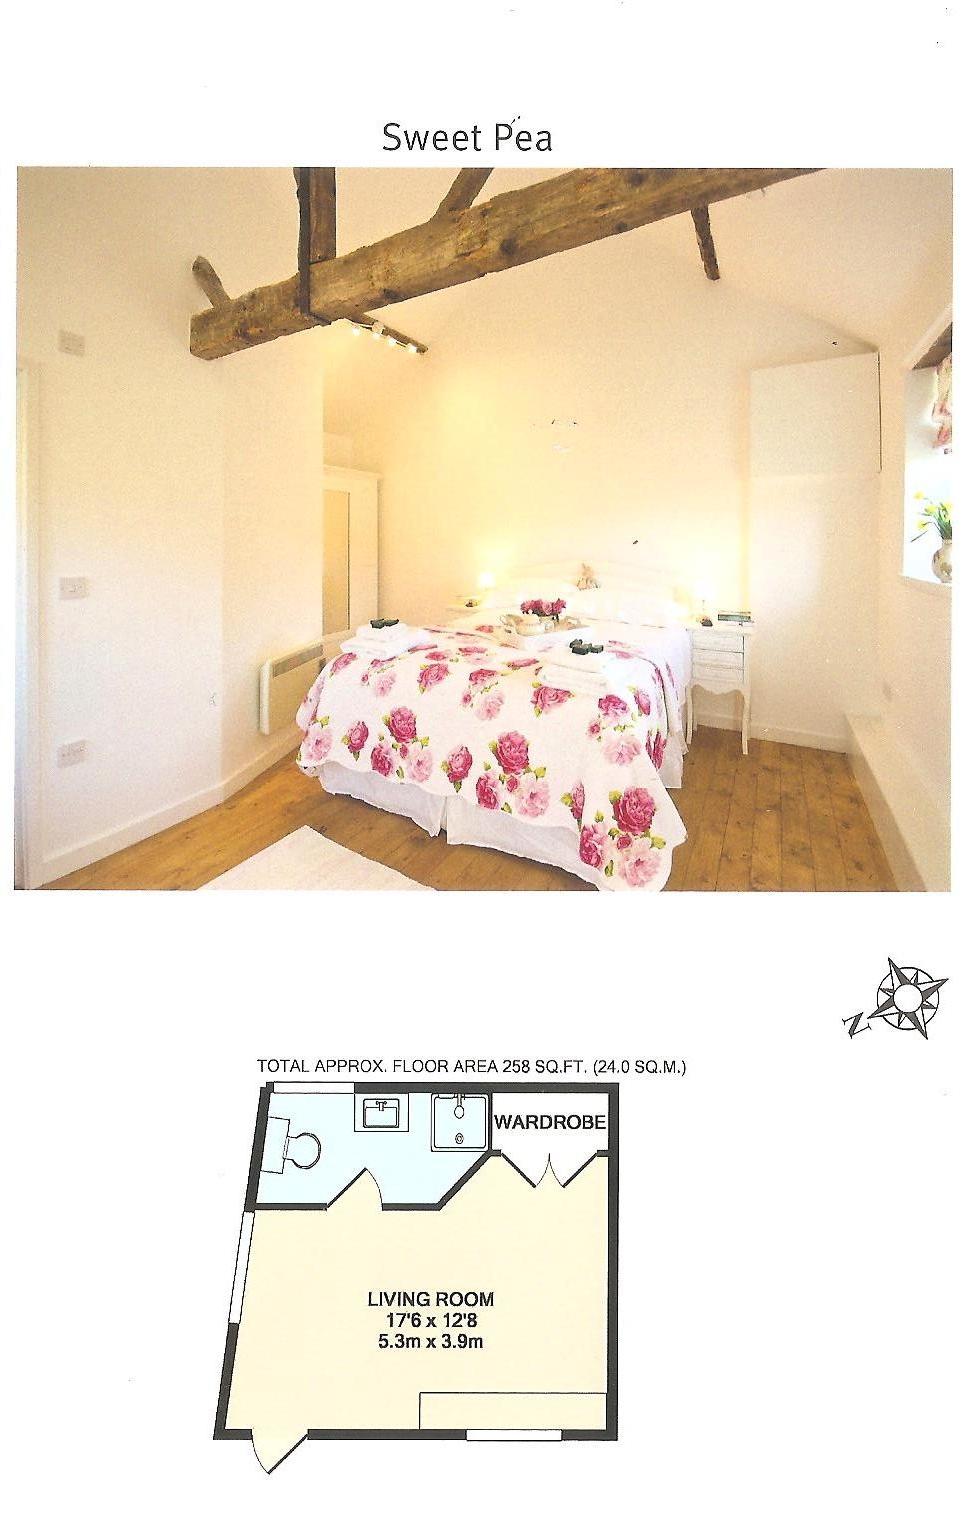 Floor Plan Balckberry & Sweet Pea 001.jpg